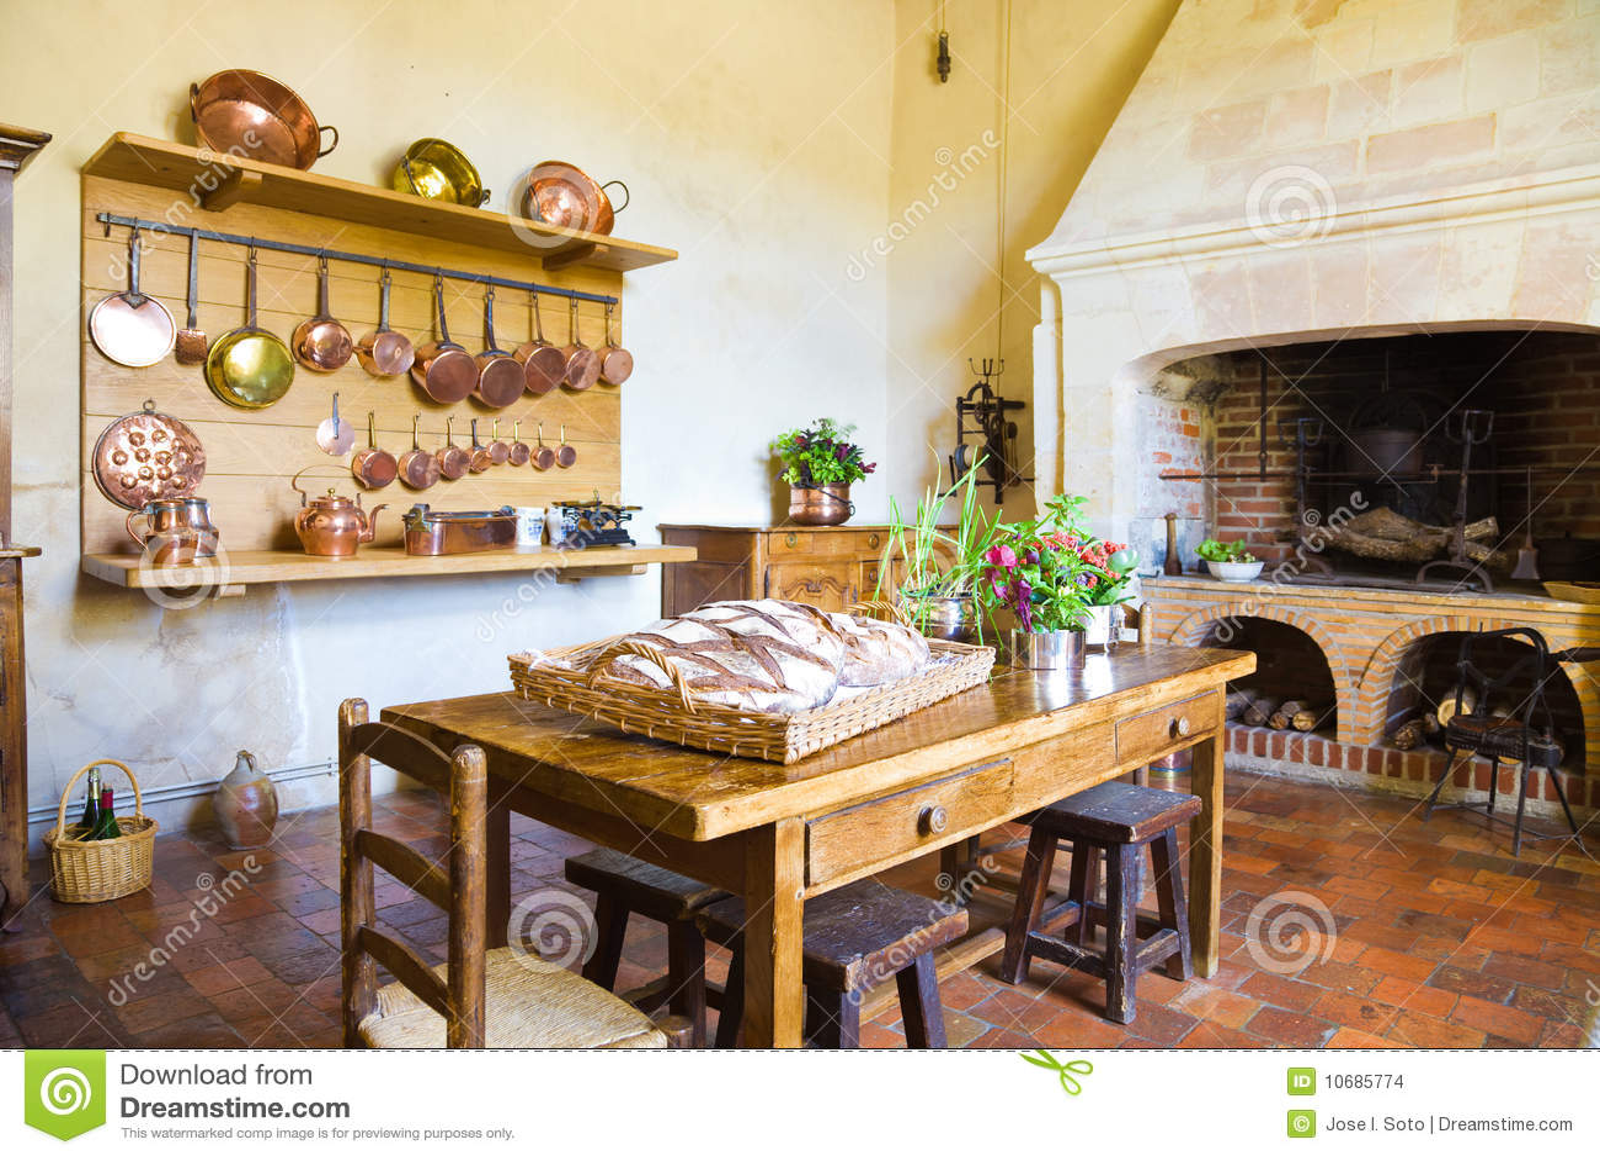 Cocina muy vieja con la chimenea imagenes de archivo for Cocinas con chimenea